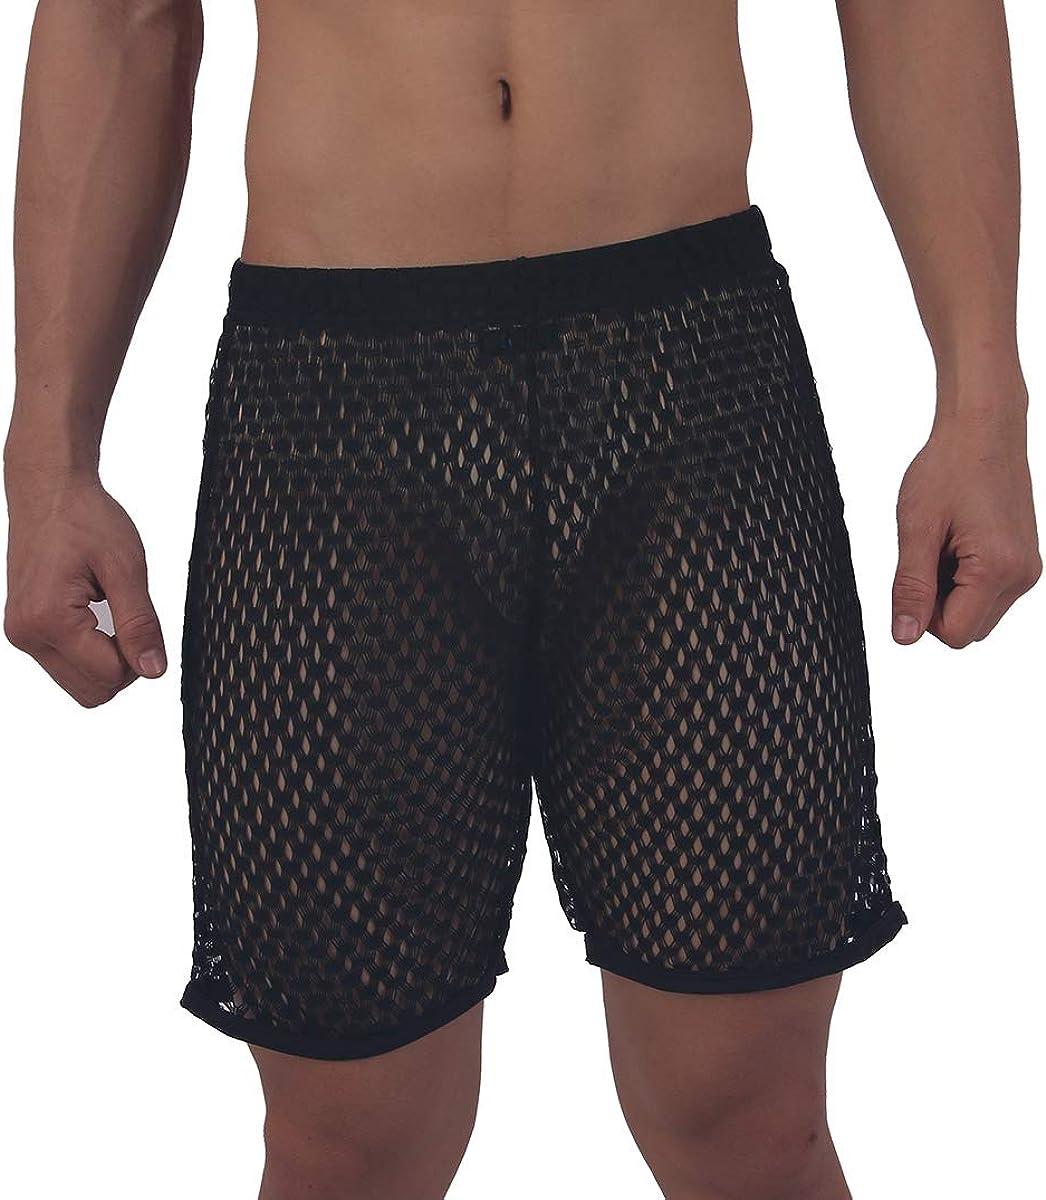 Sissy Mens Mesh Sheer See Through Boxer Briefs Trunks Underwear Swimming Shorts